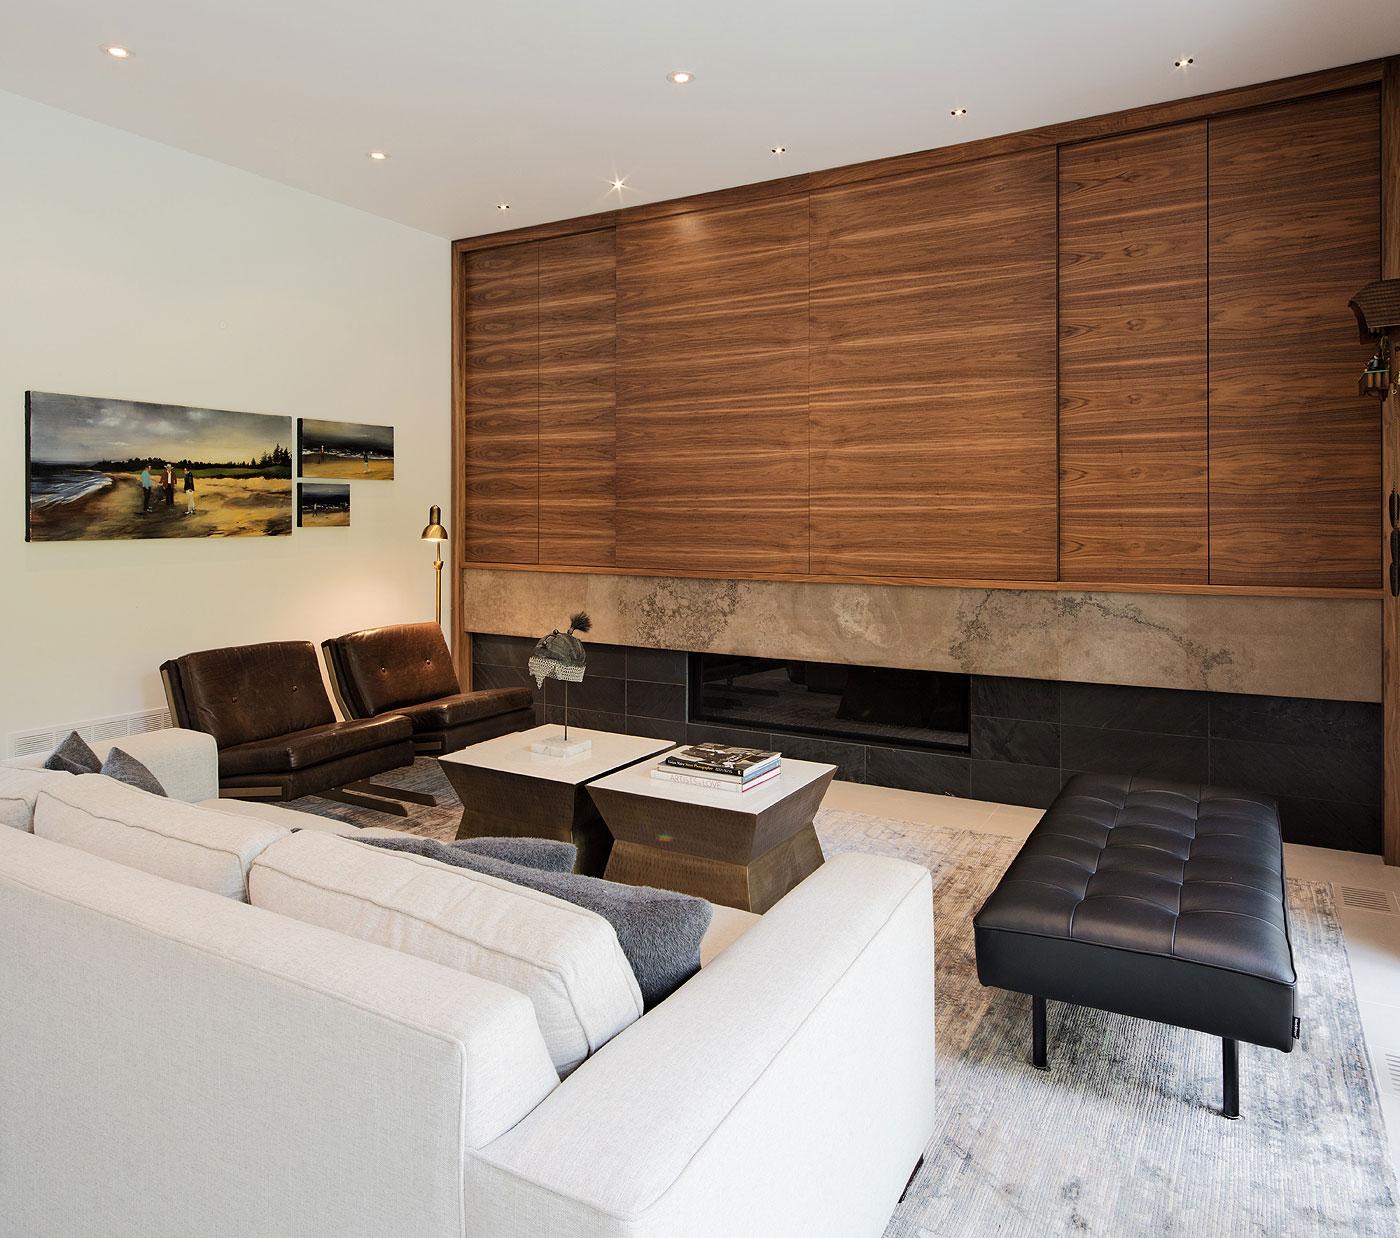 residencia-heathdale-tact-architecture-design (4)